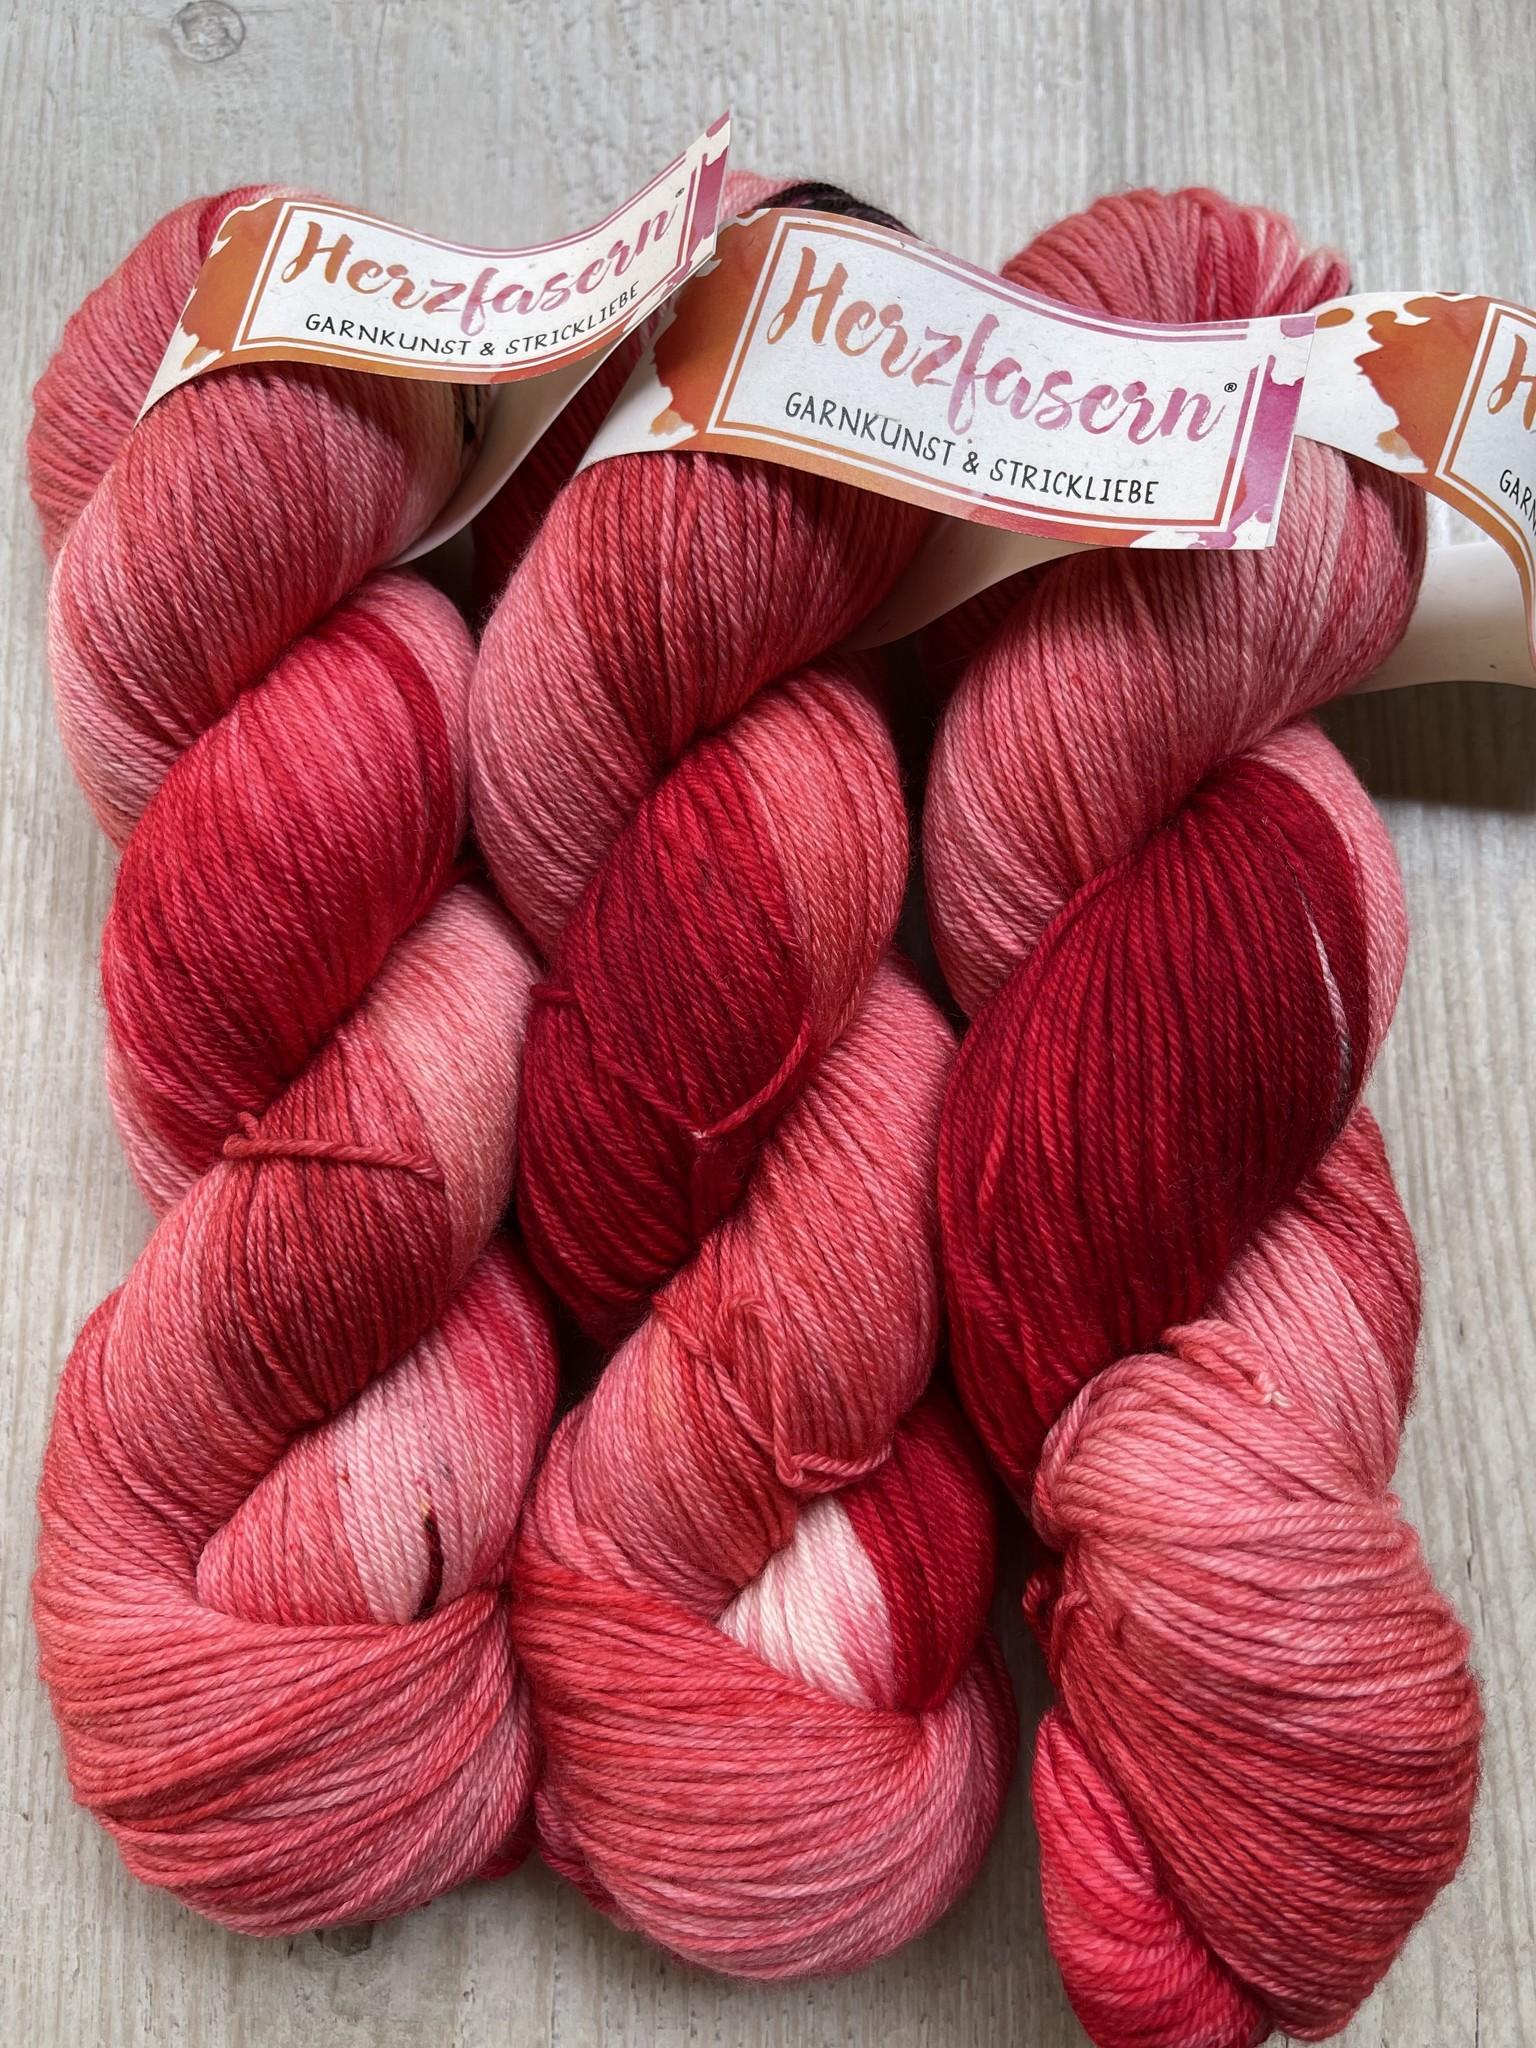 Herzfasern  Merino 400   Flowers in Red